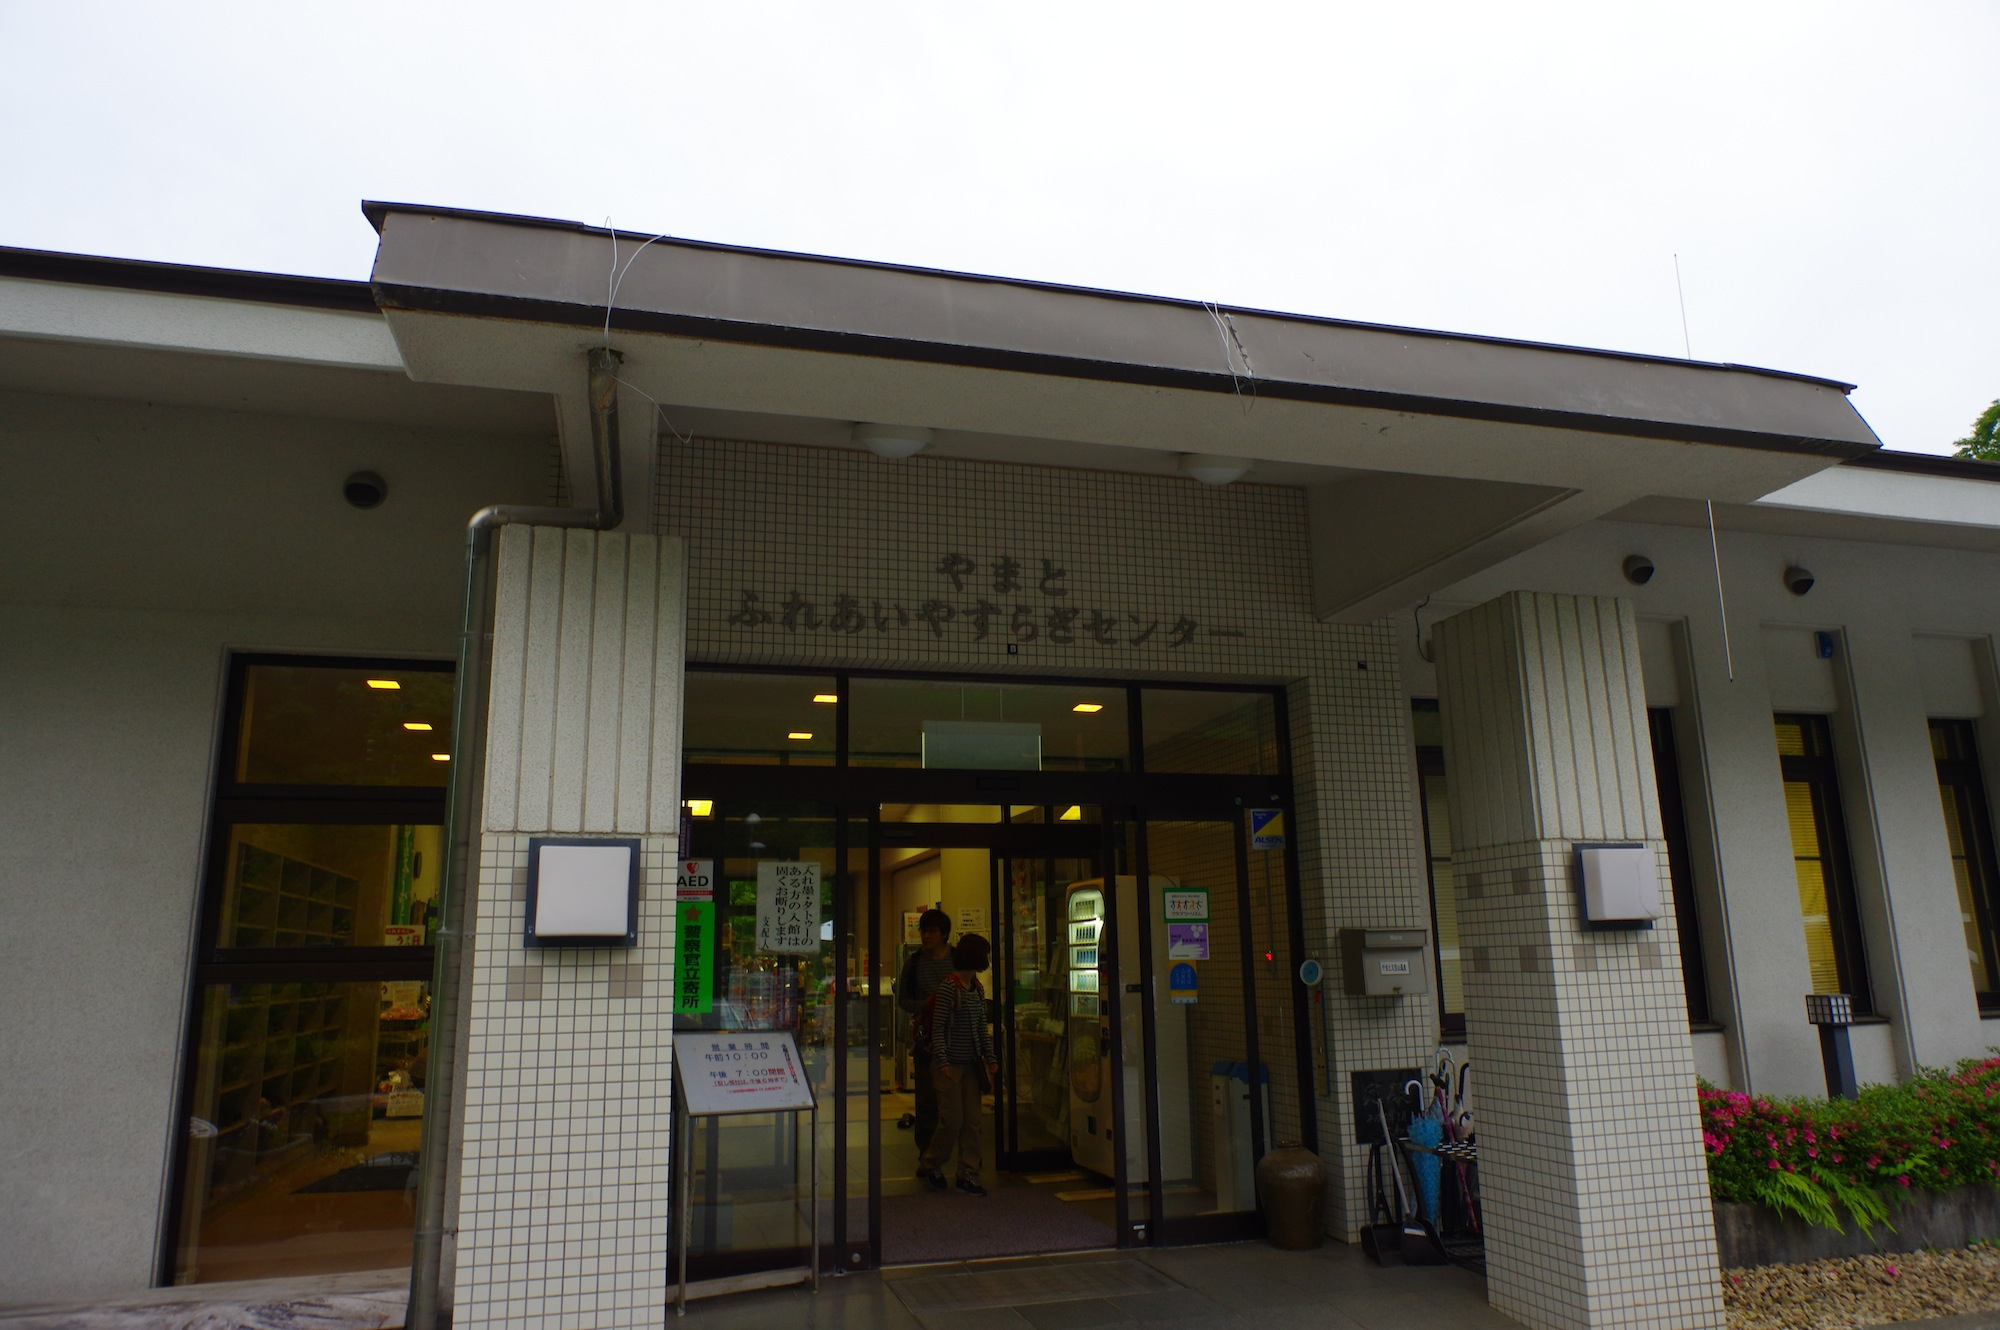 f:id:sakemaro:20150621233912j:plain